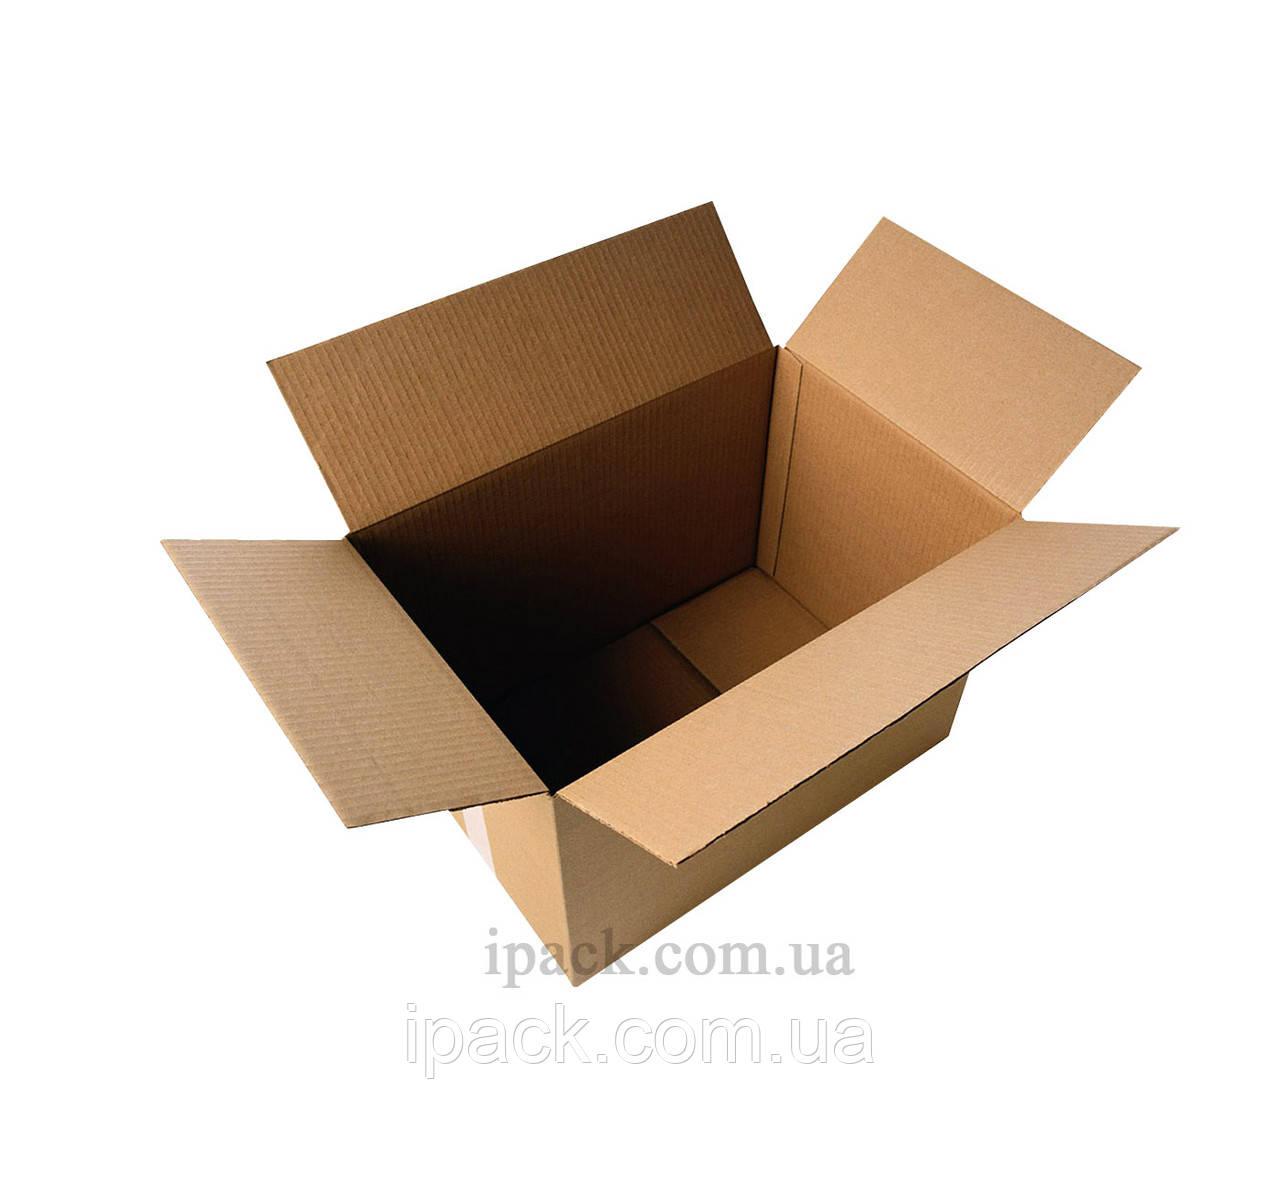 Гофроящик 610*395*375 мм бурый четырехклапанный картонный короб